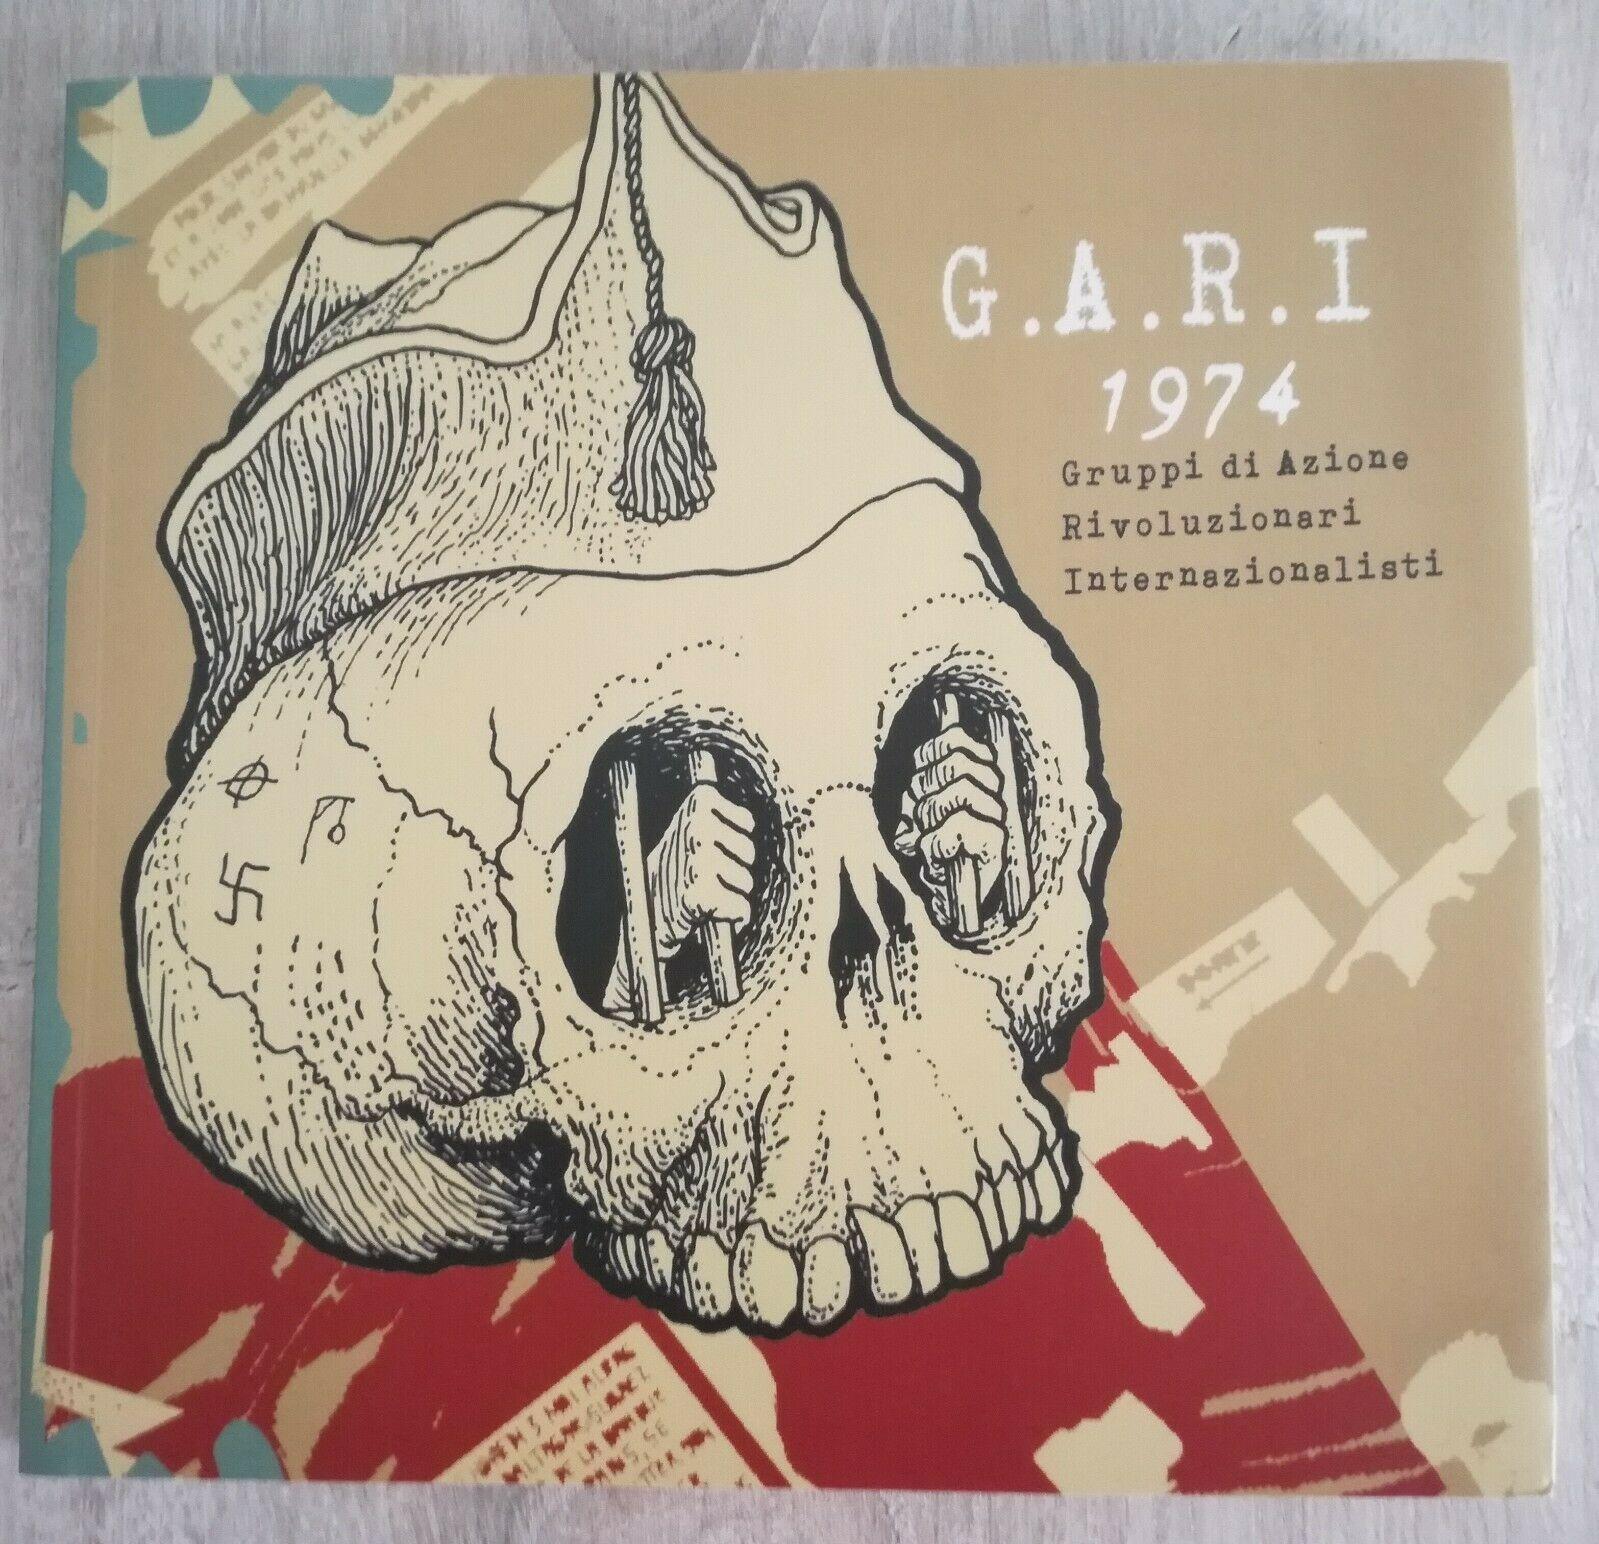 G.A.R.I. 1974